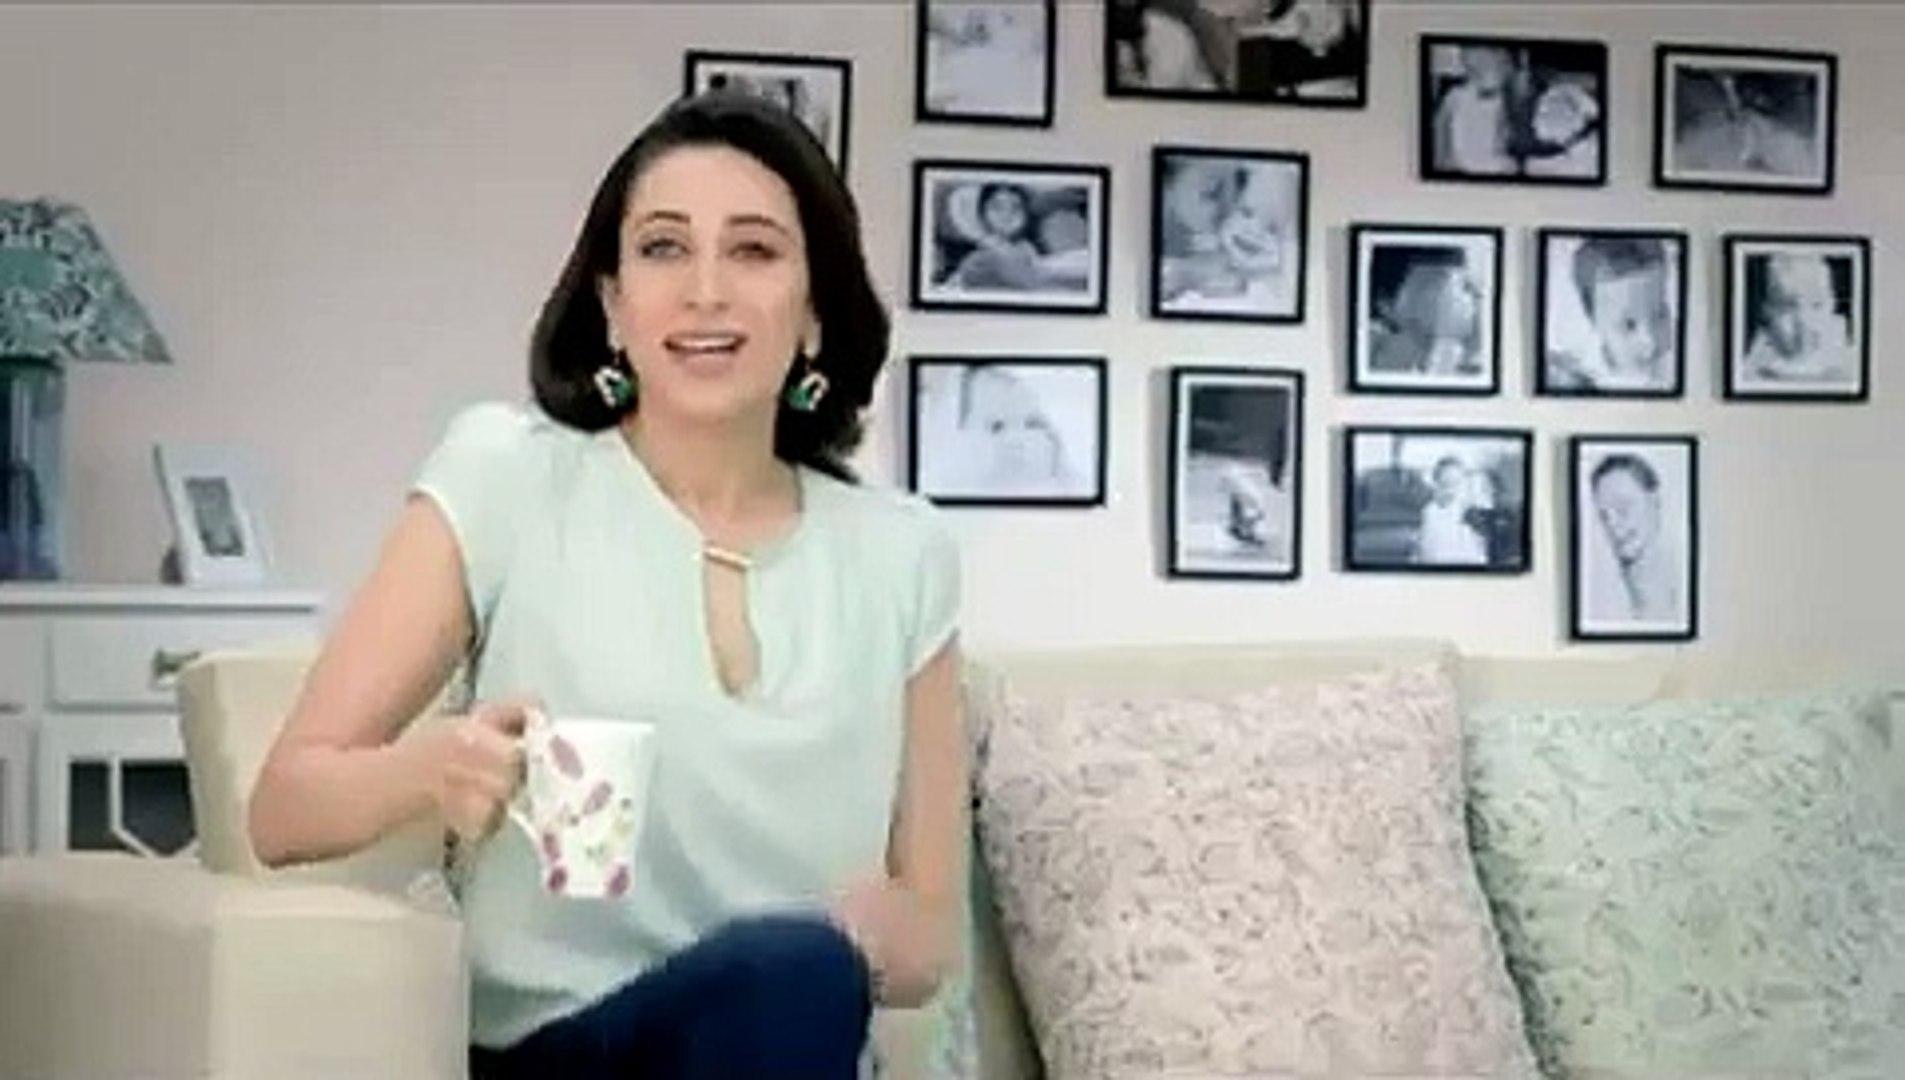 Lovely Karisma Kapoors Latest AD for babyoye.com - Online Store For Kids of India - Bollywood